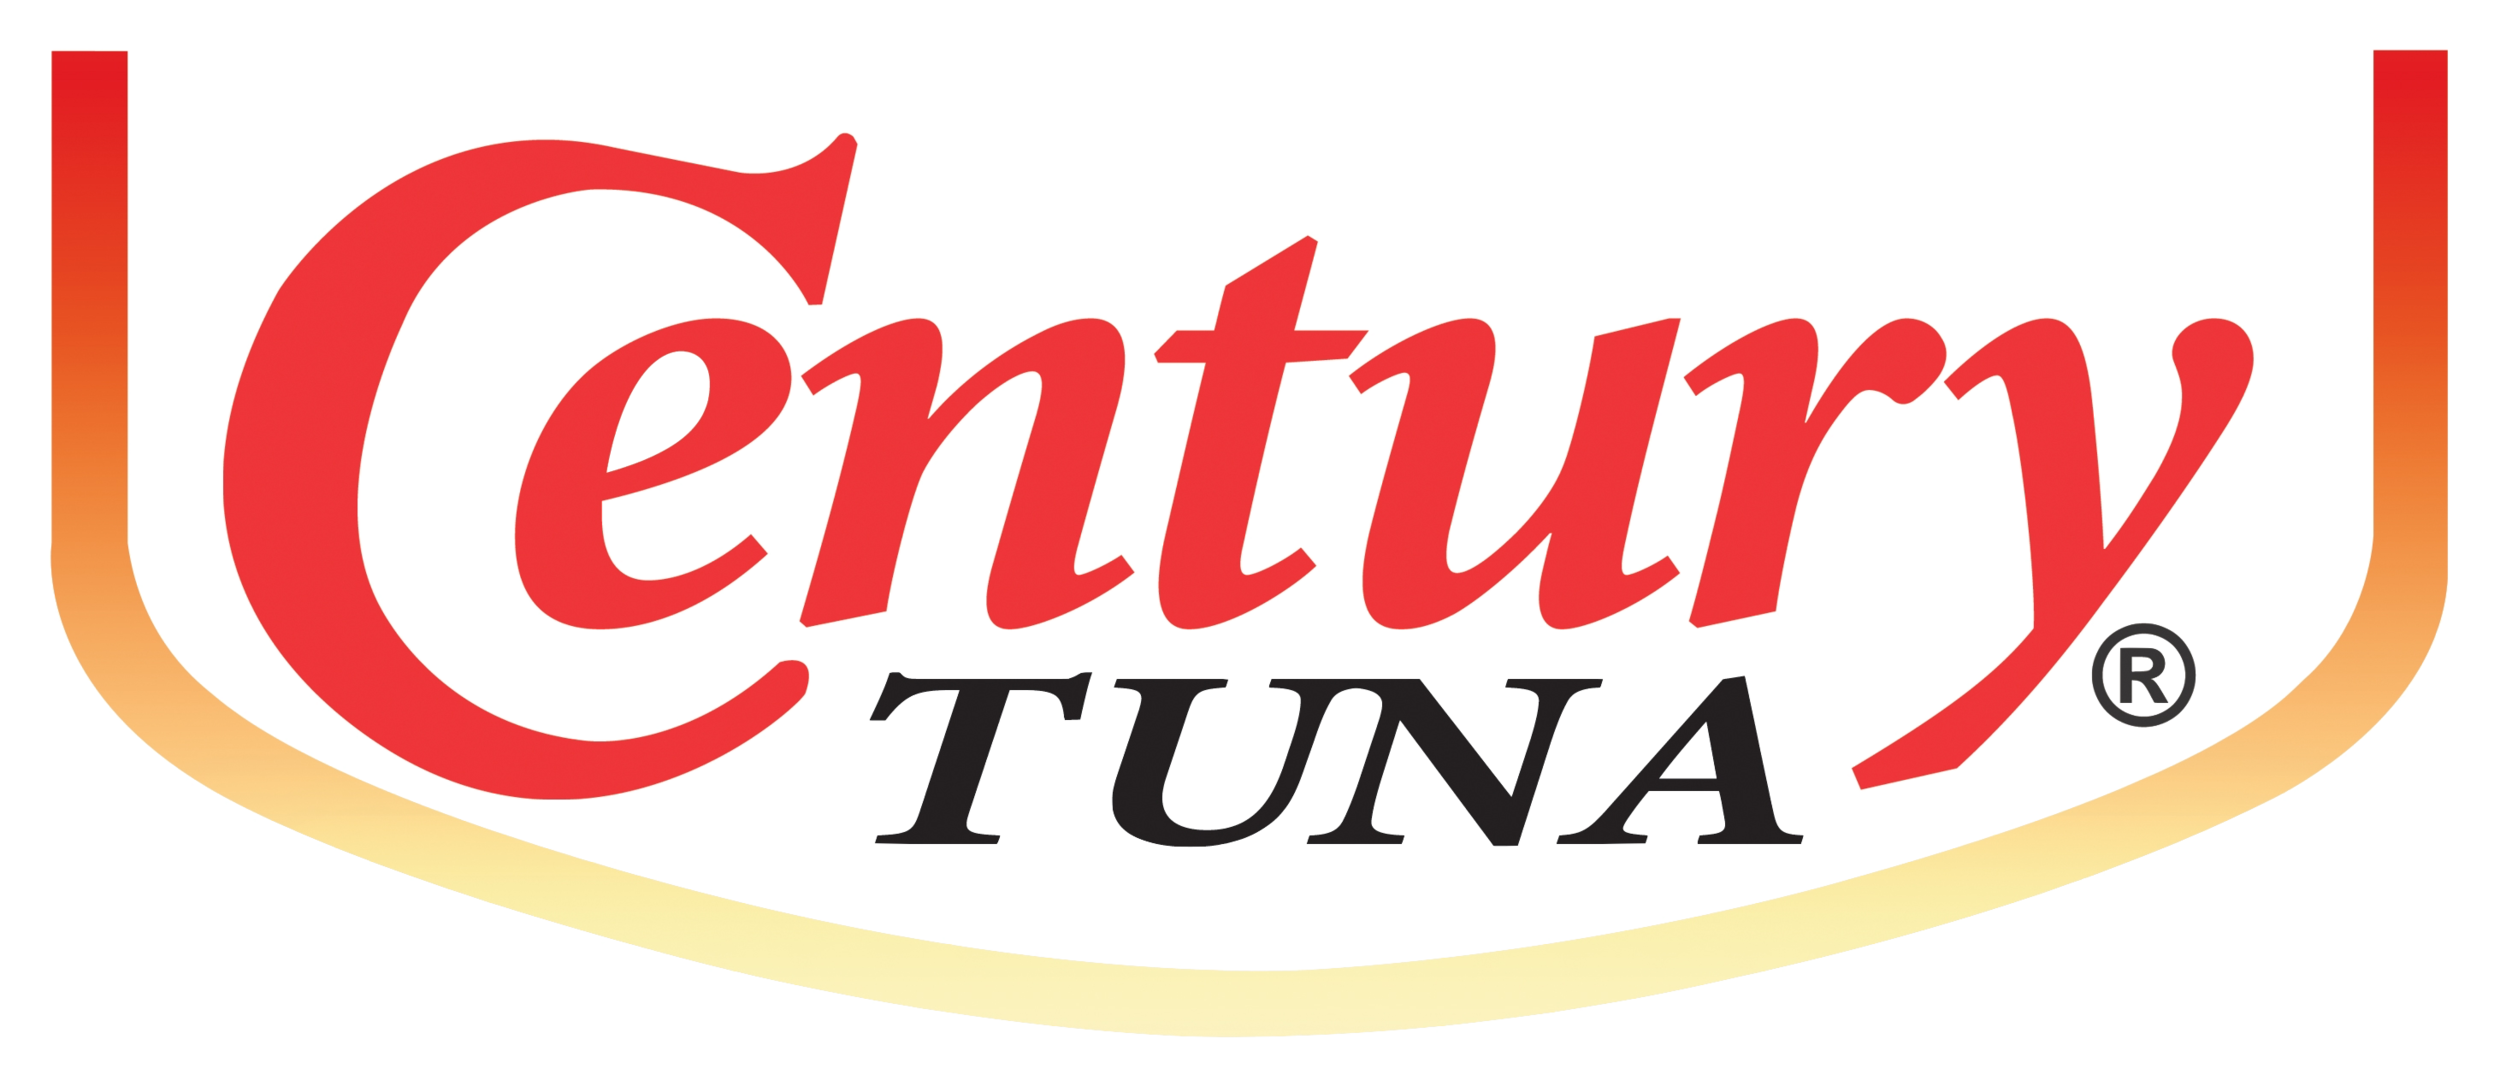 Century-Tuna.png